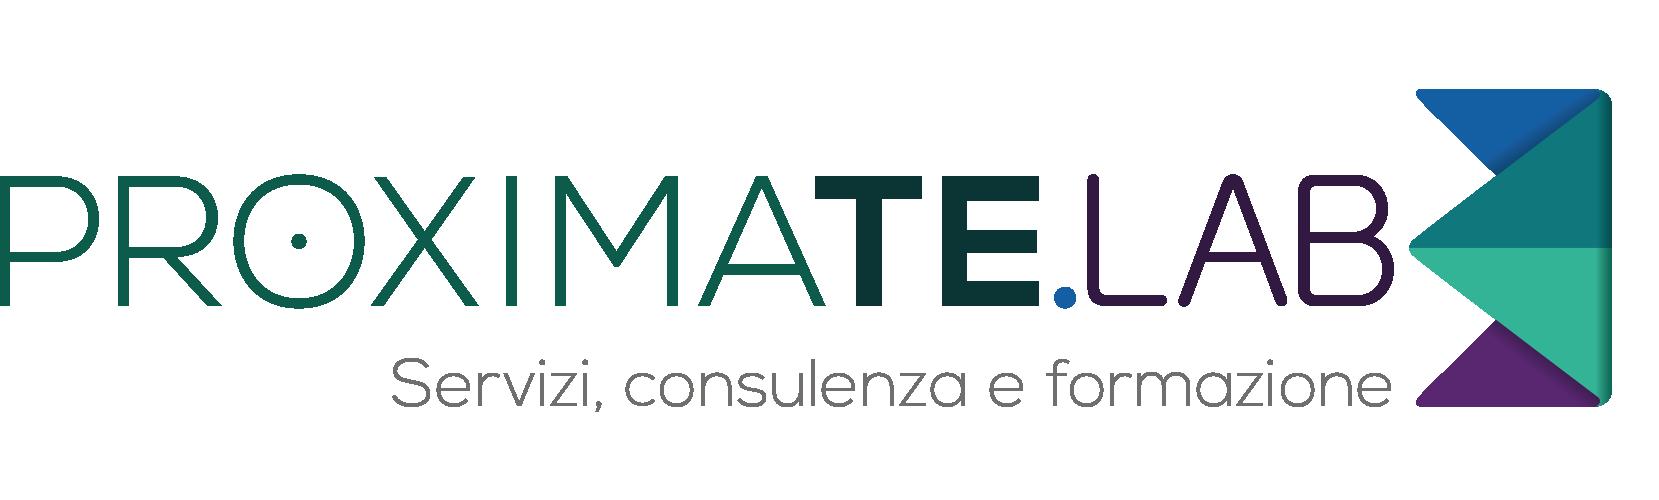 www.proximatelab.it